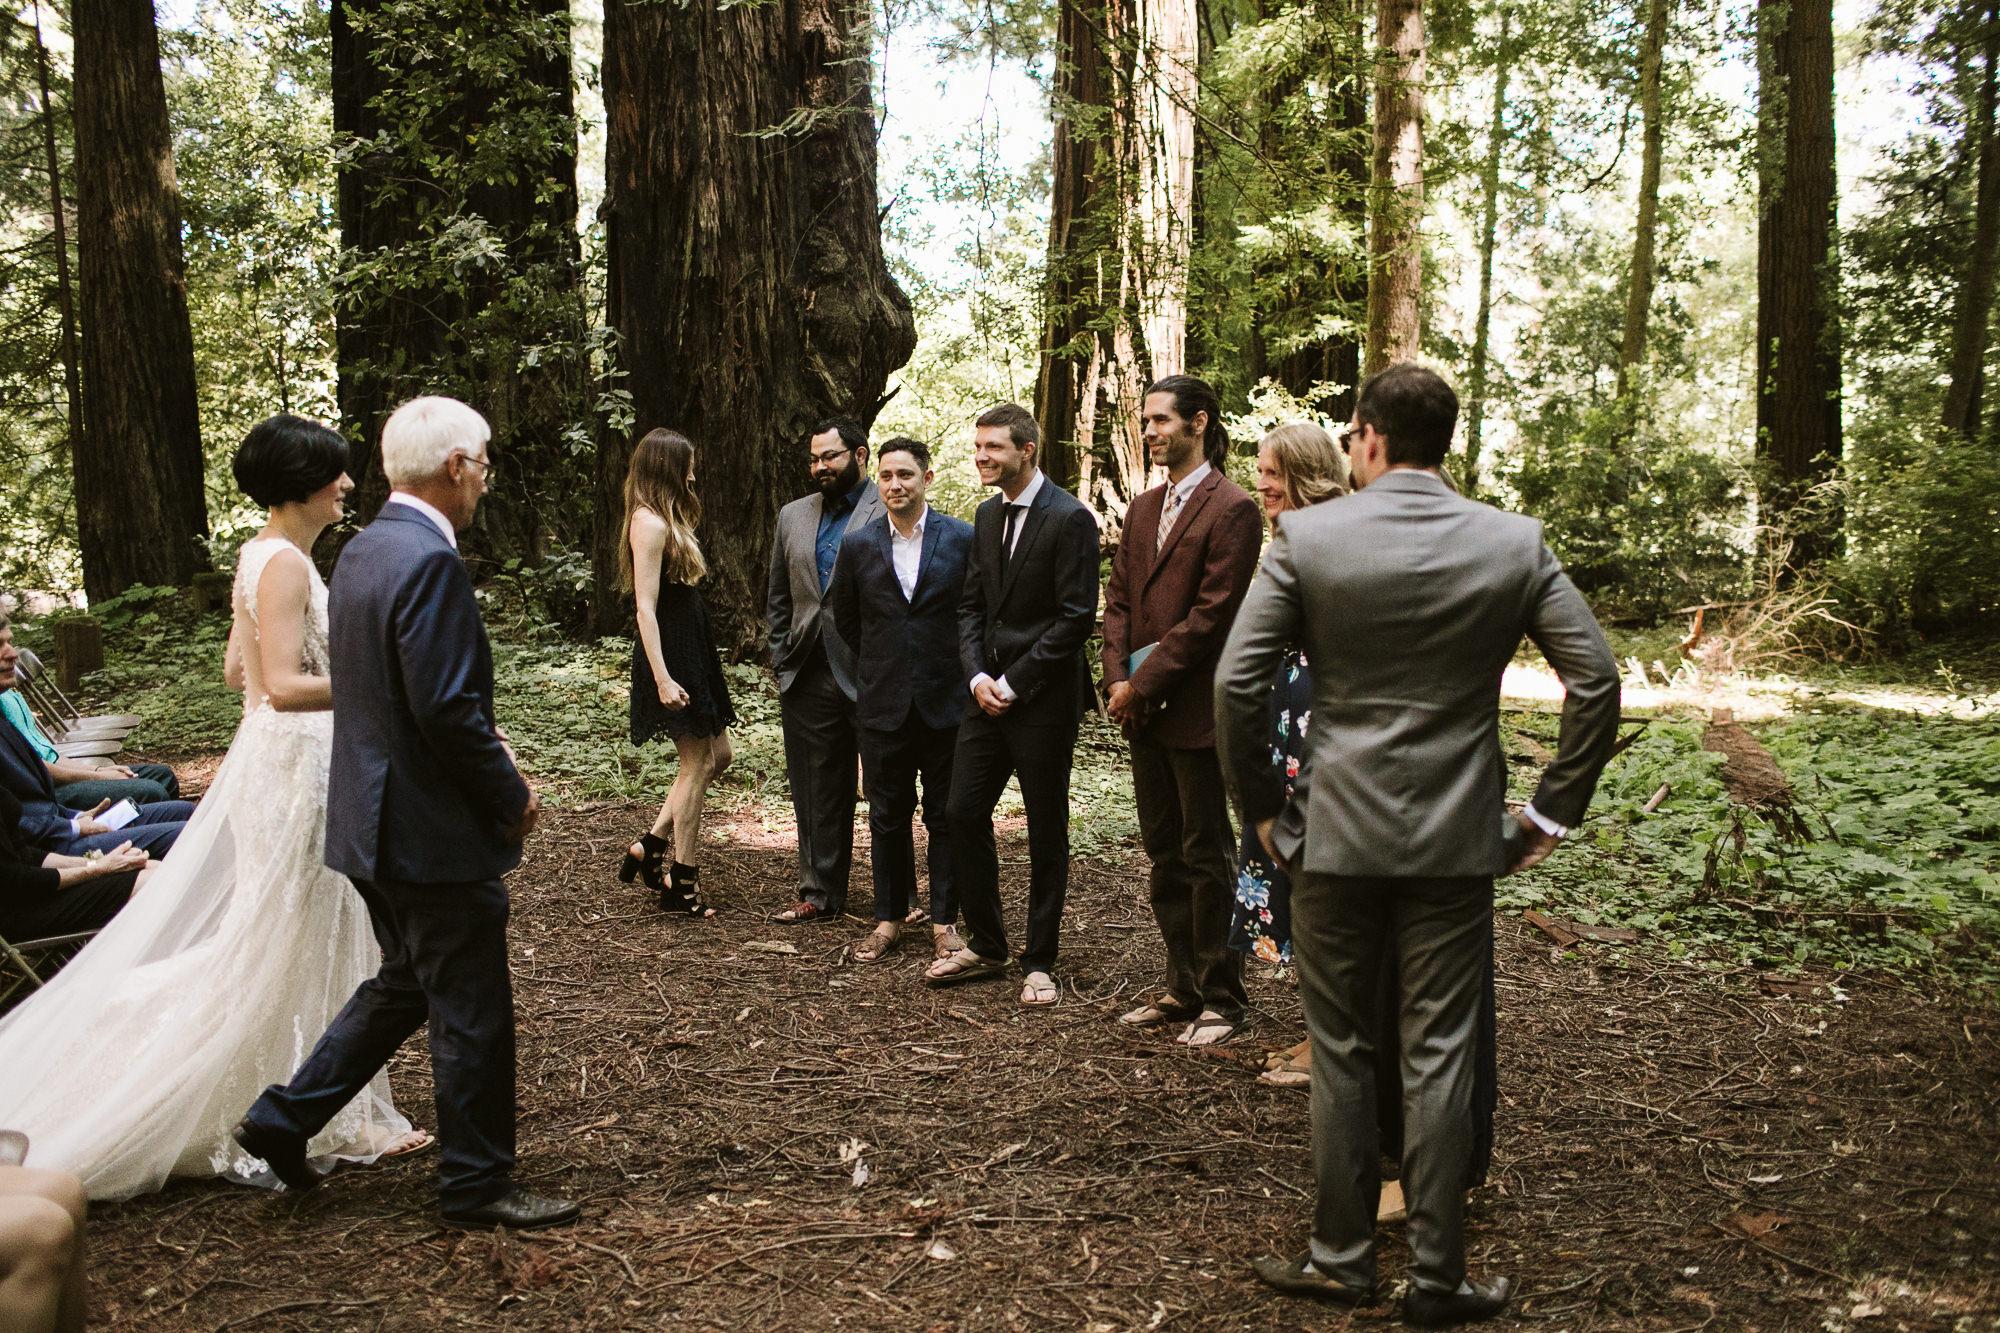 California-wedding-photographer-alfonso-flores-pamplin-groove-172.jpg